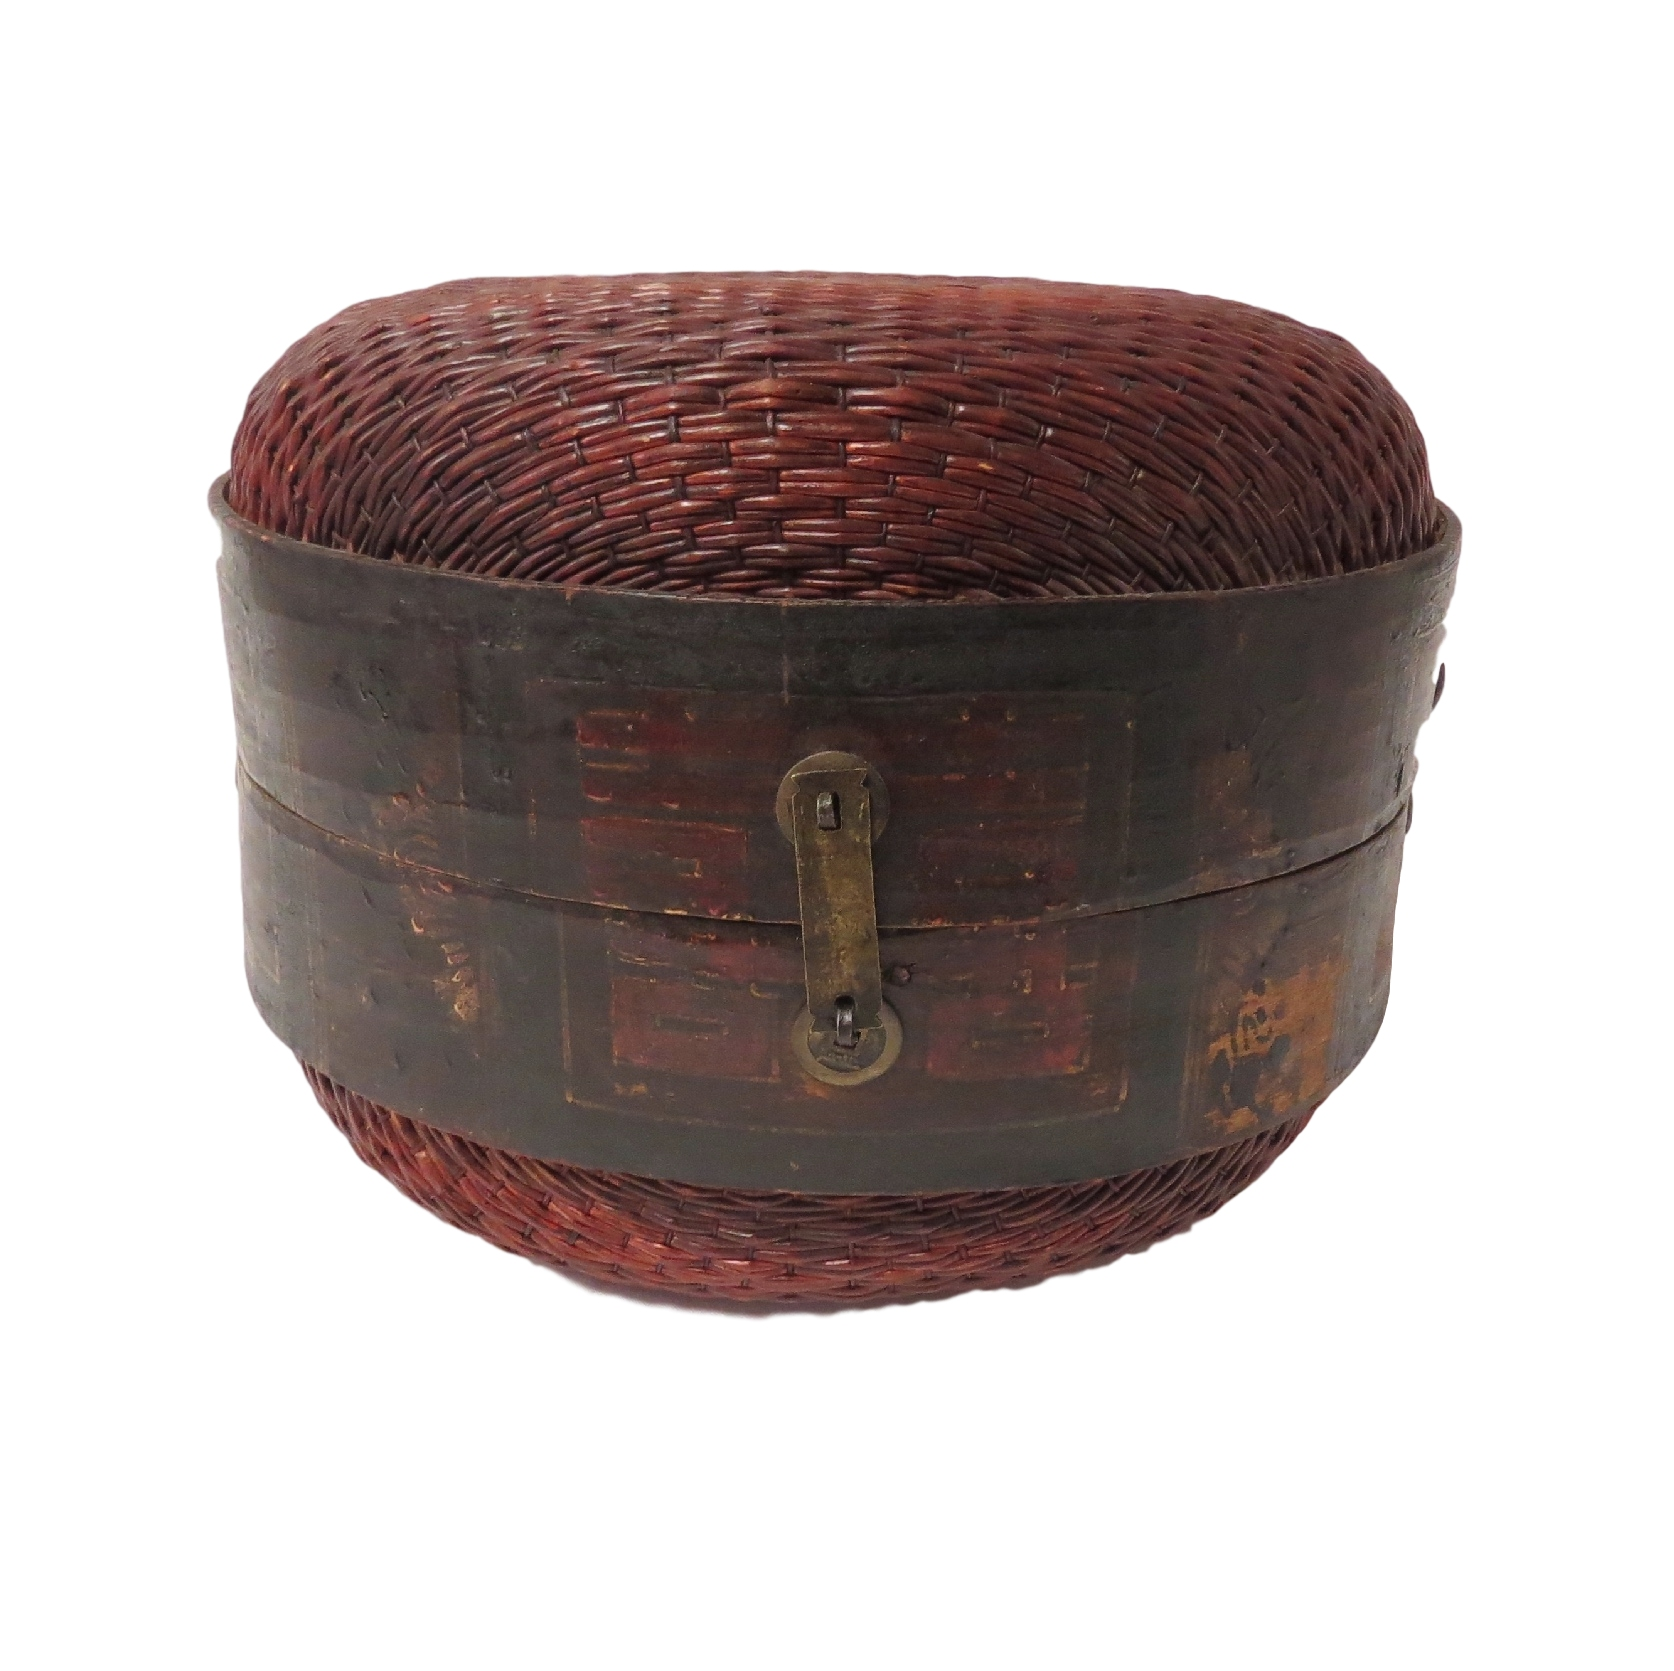 Vintage Thai Hat Box  14dx11h  OP088